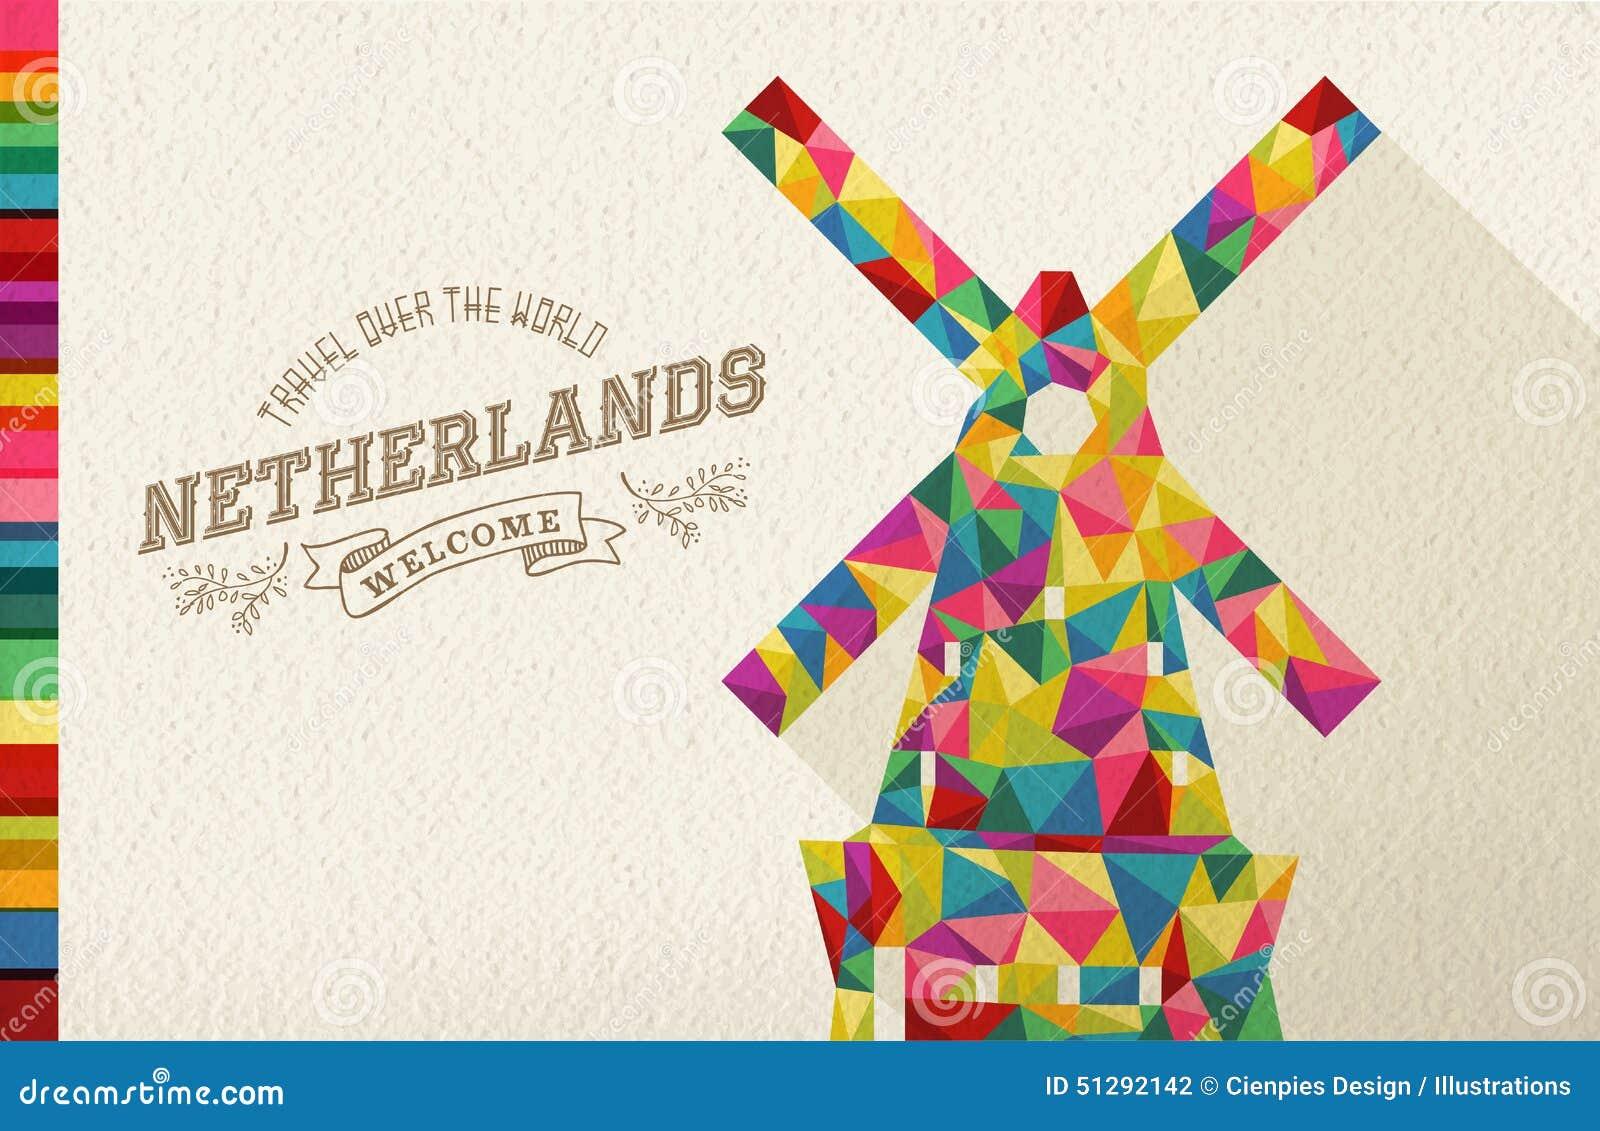 Amsterdam tourism marketing condition tourism essay